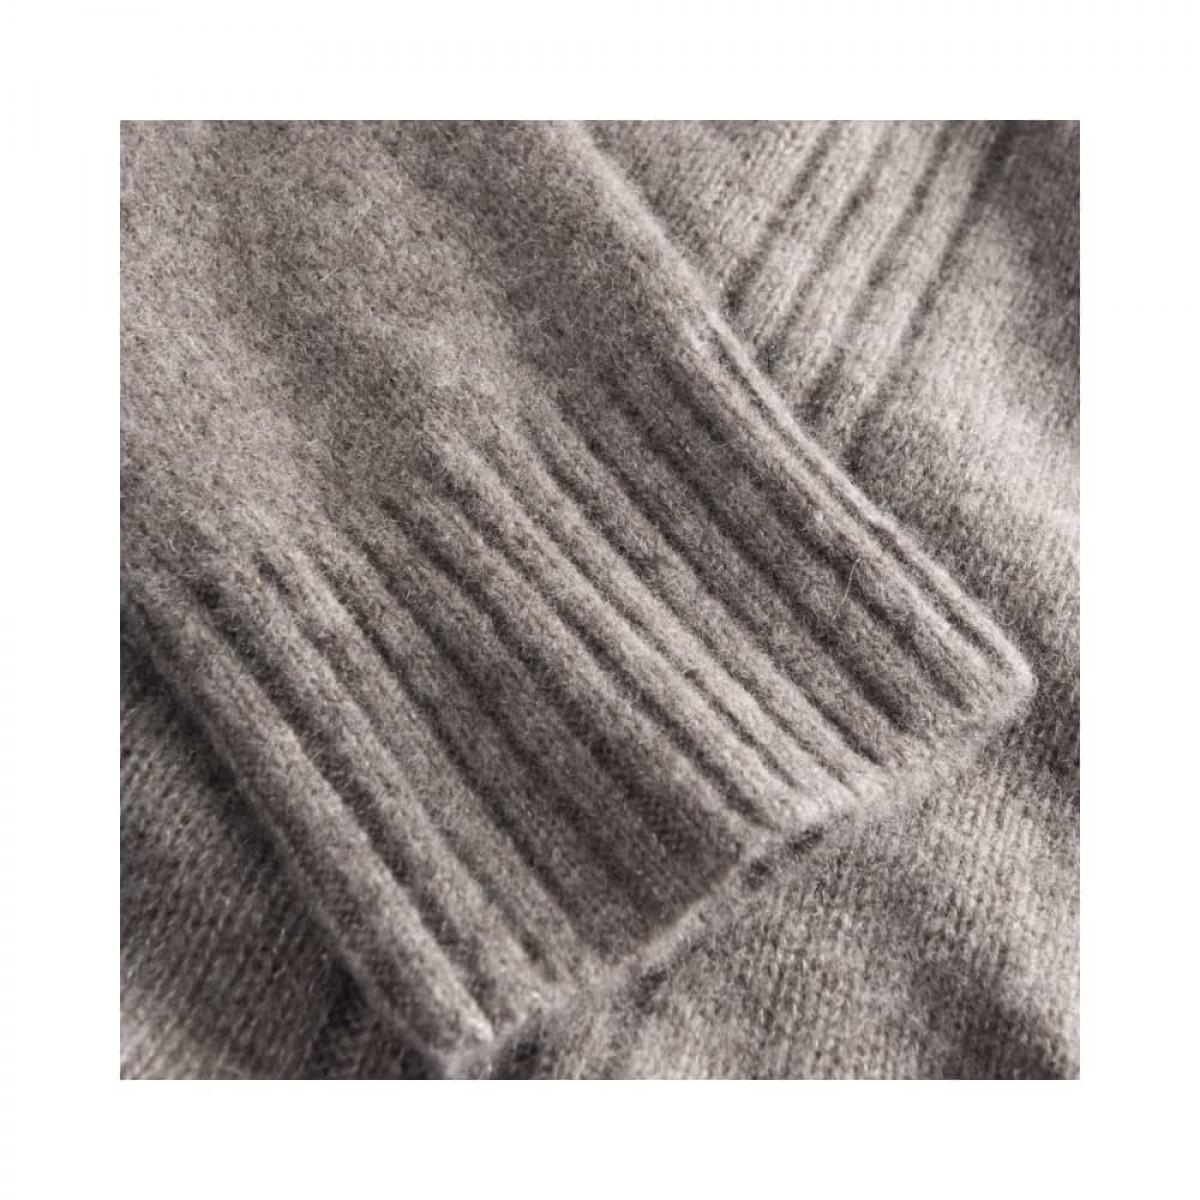 kristin rullekrave strik - hazelnut - ærme detalje